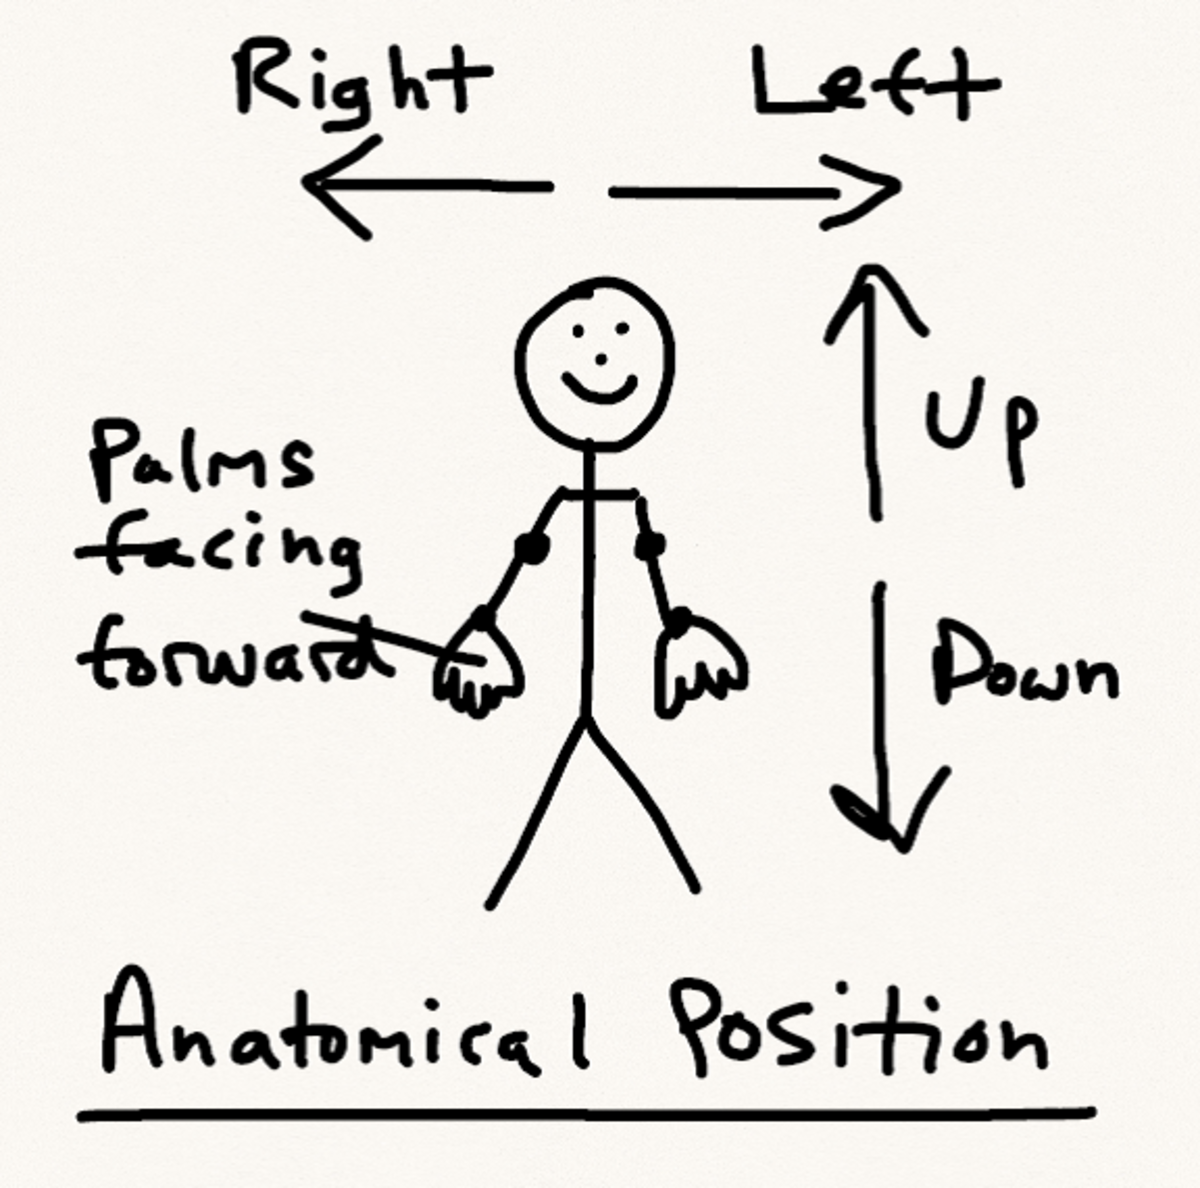 Human Anatomy: Anatomical Terminology, Orientation, and Movement